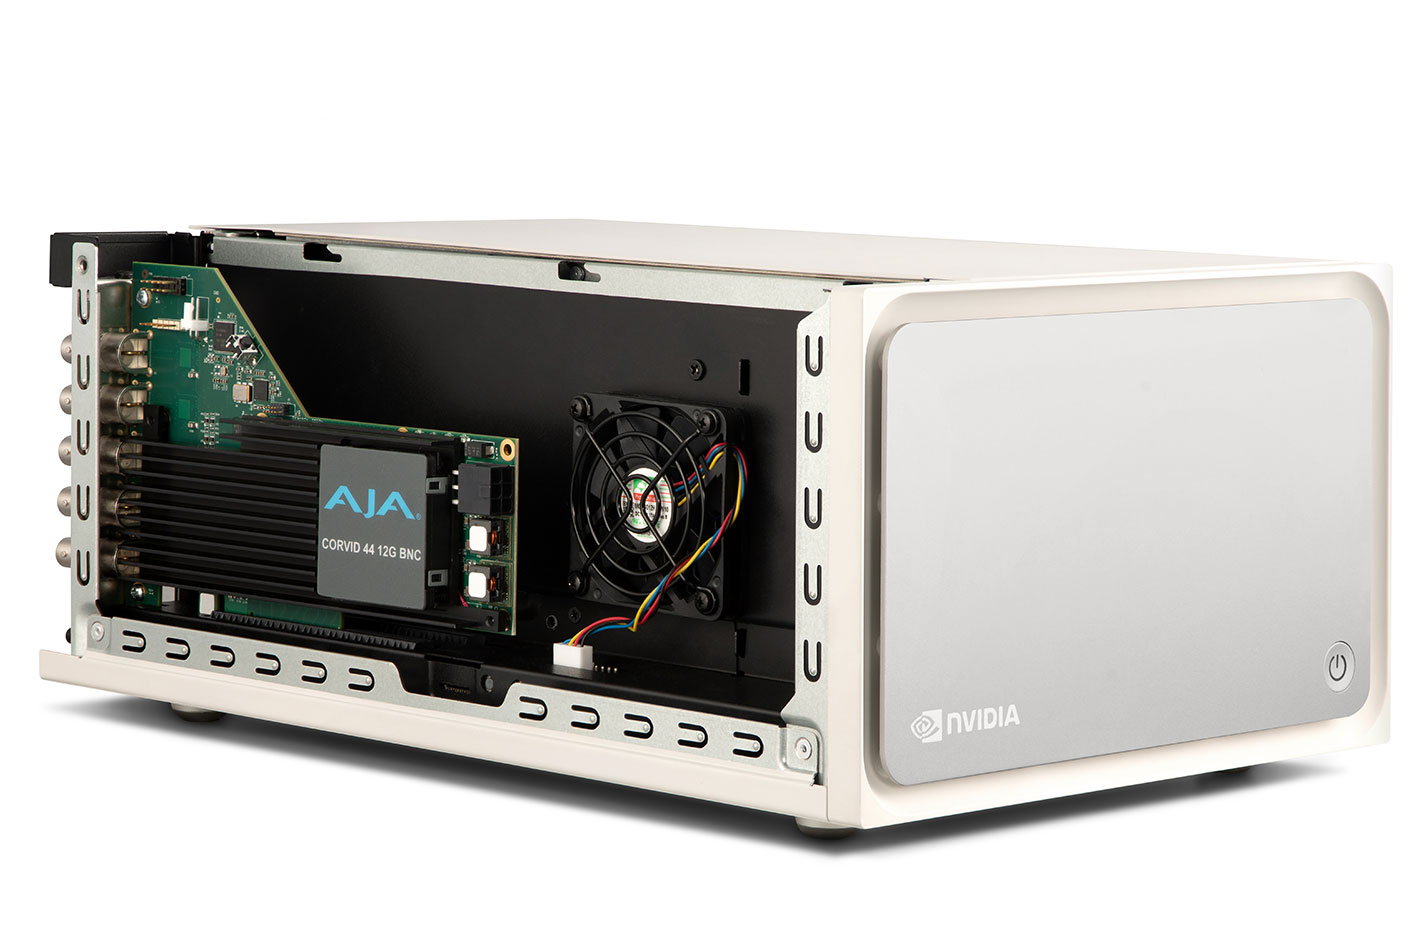 AJA adopts NVIDIA platform to offer AI-Driven developer solutions